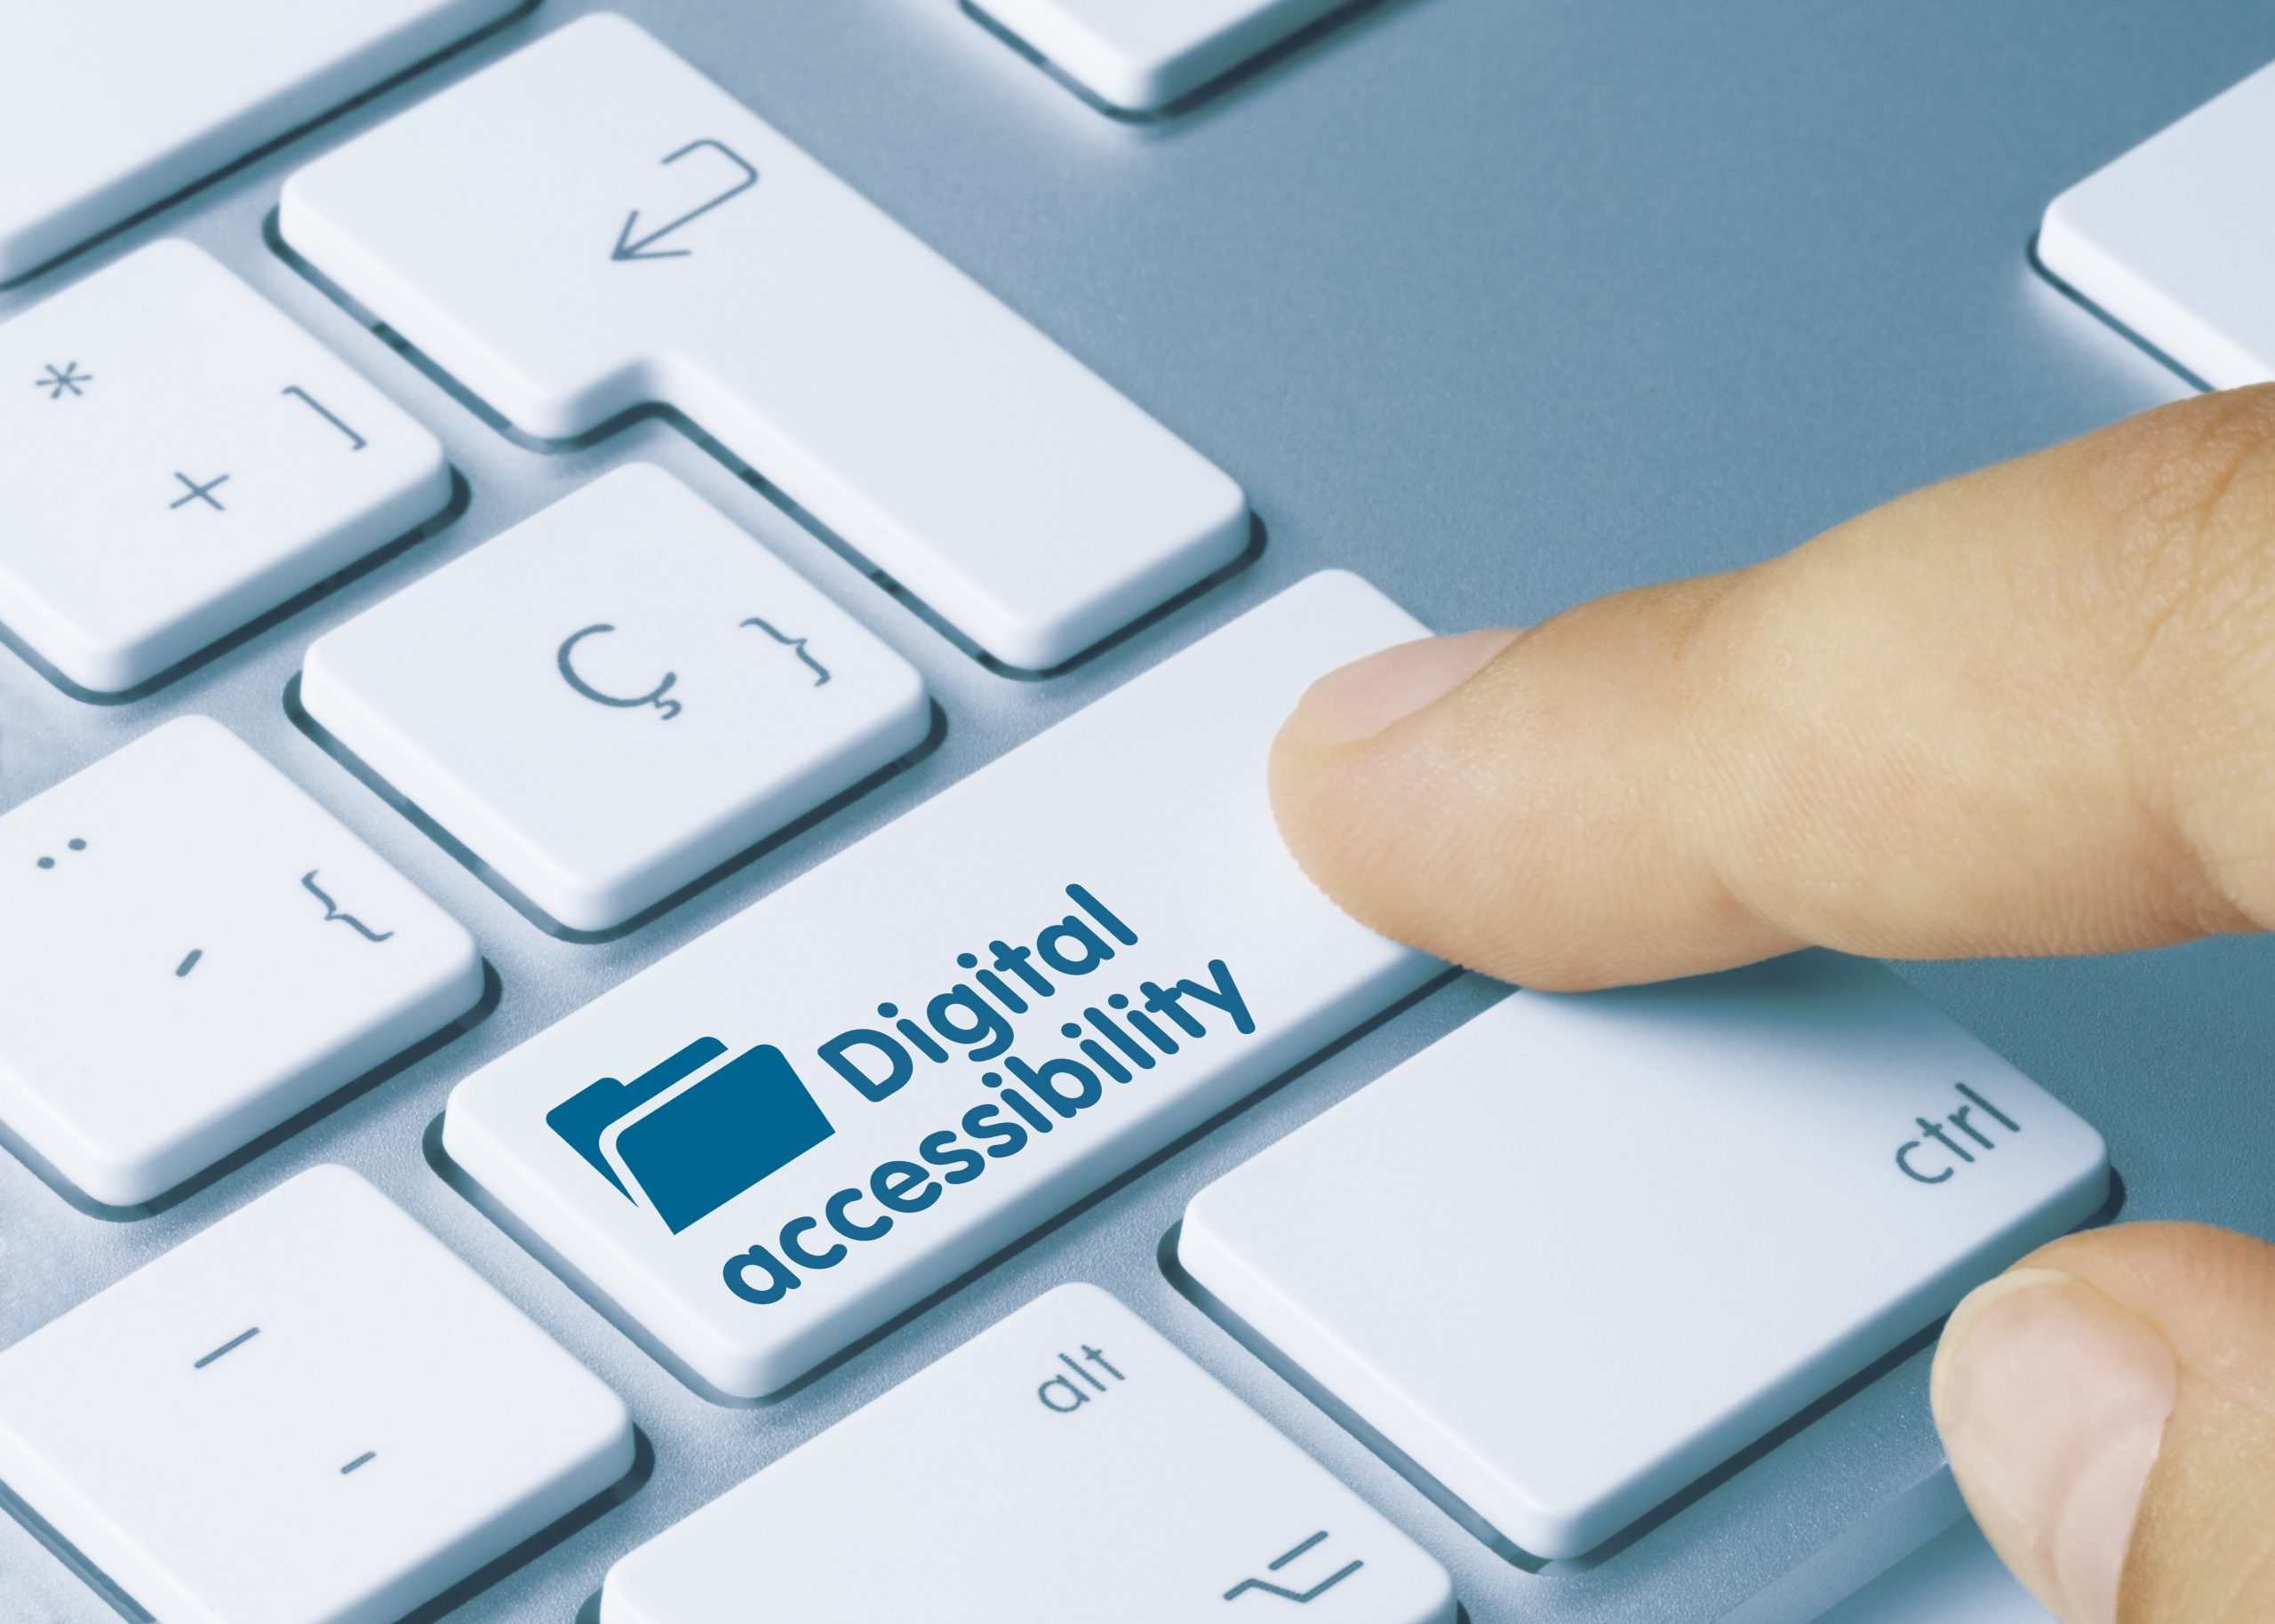 web accessibility concept